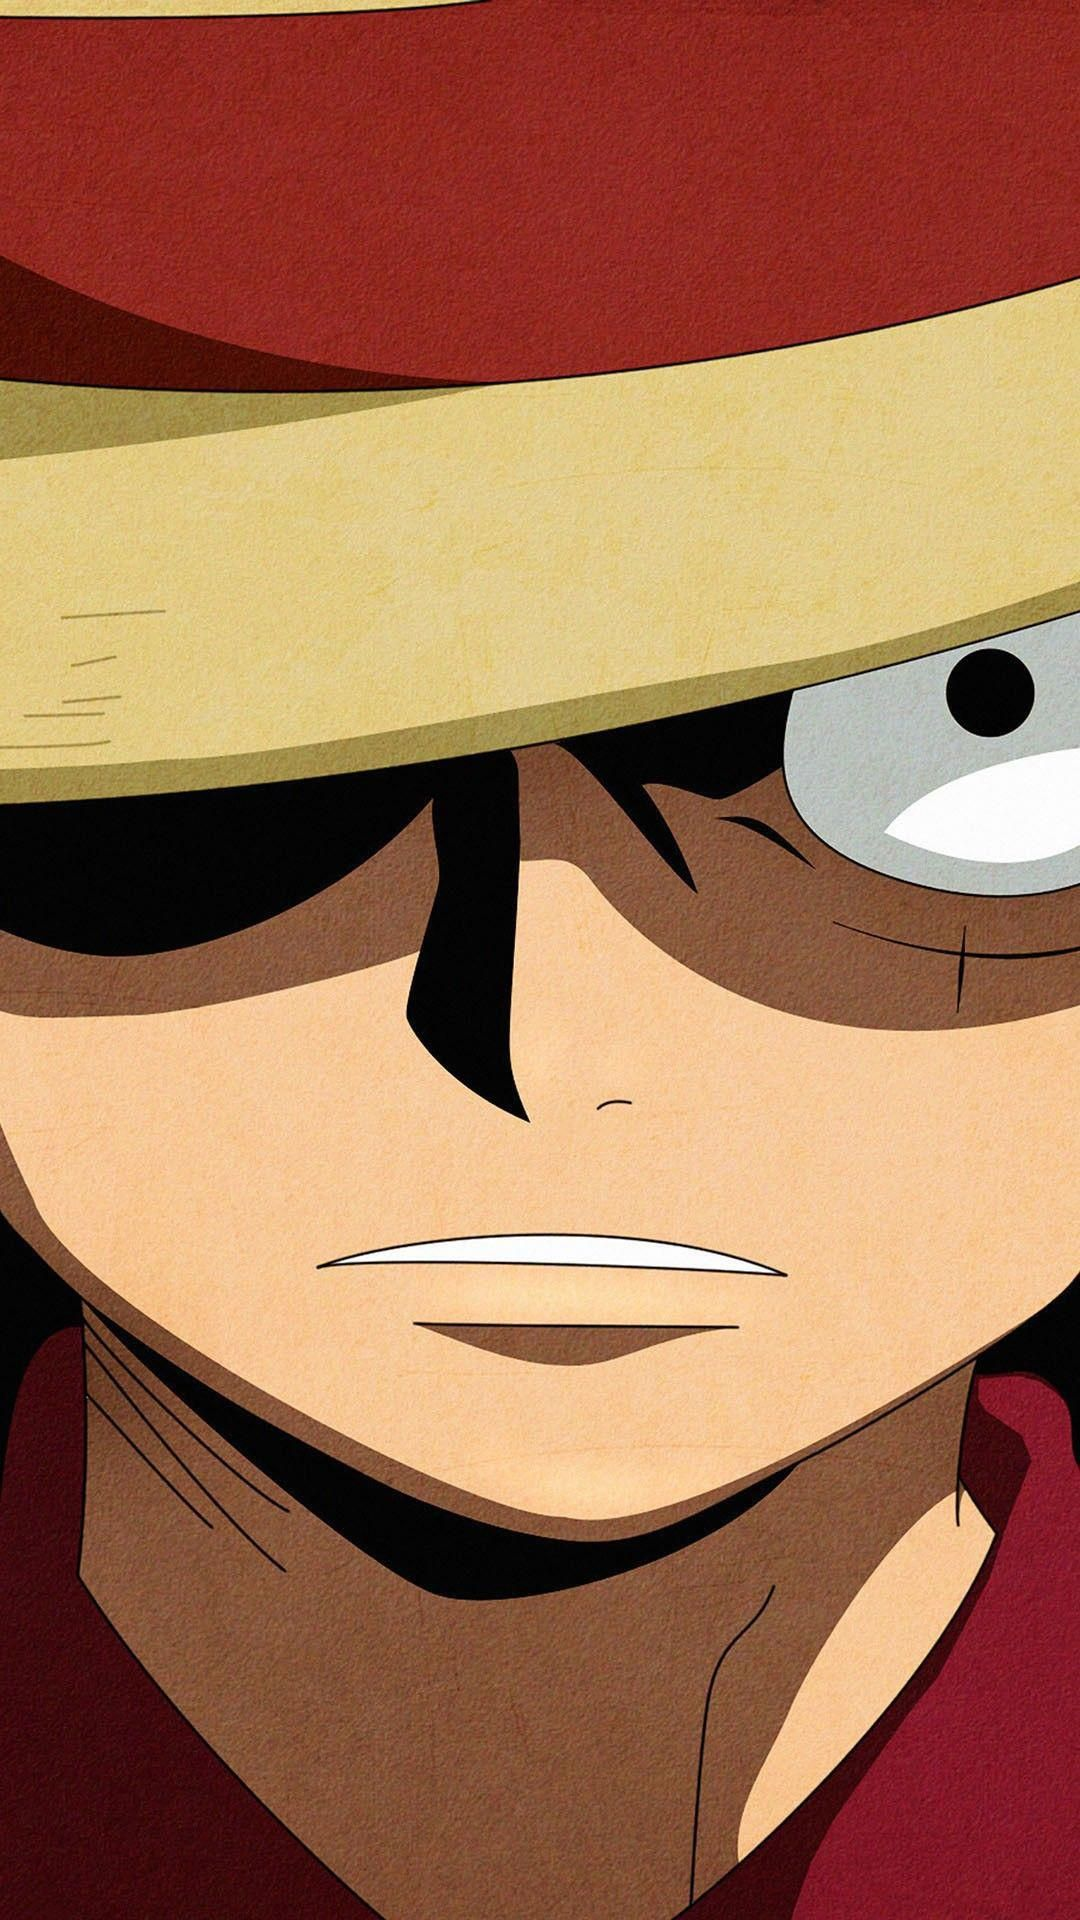 Straw Hat Luffy One Piece Manga Smartphone Wallpaper And Lockscreen Hd Smartphoneaddiction Tatuagens De Anime Manga One Piece Personagens De Anime